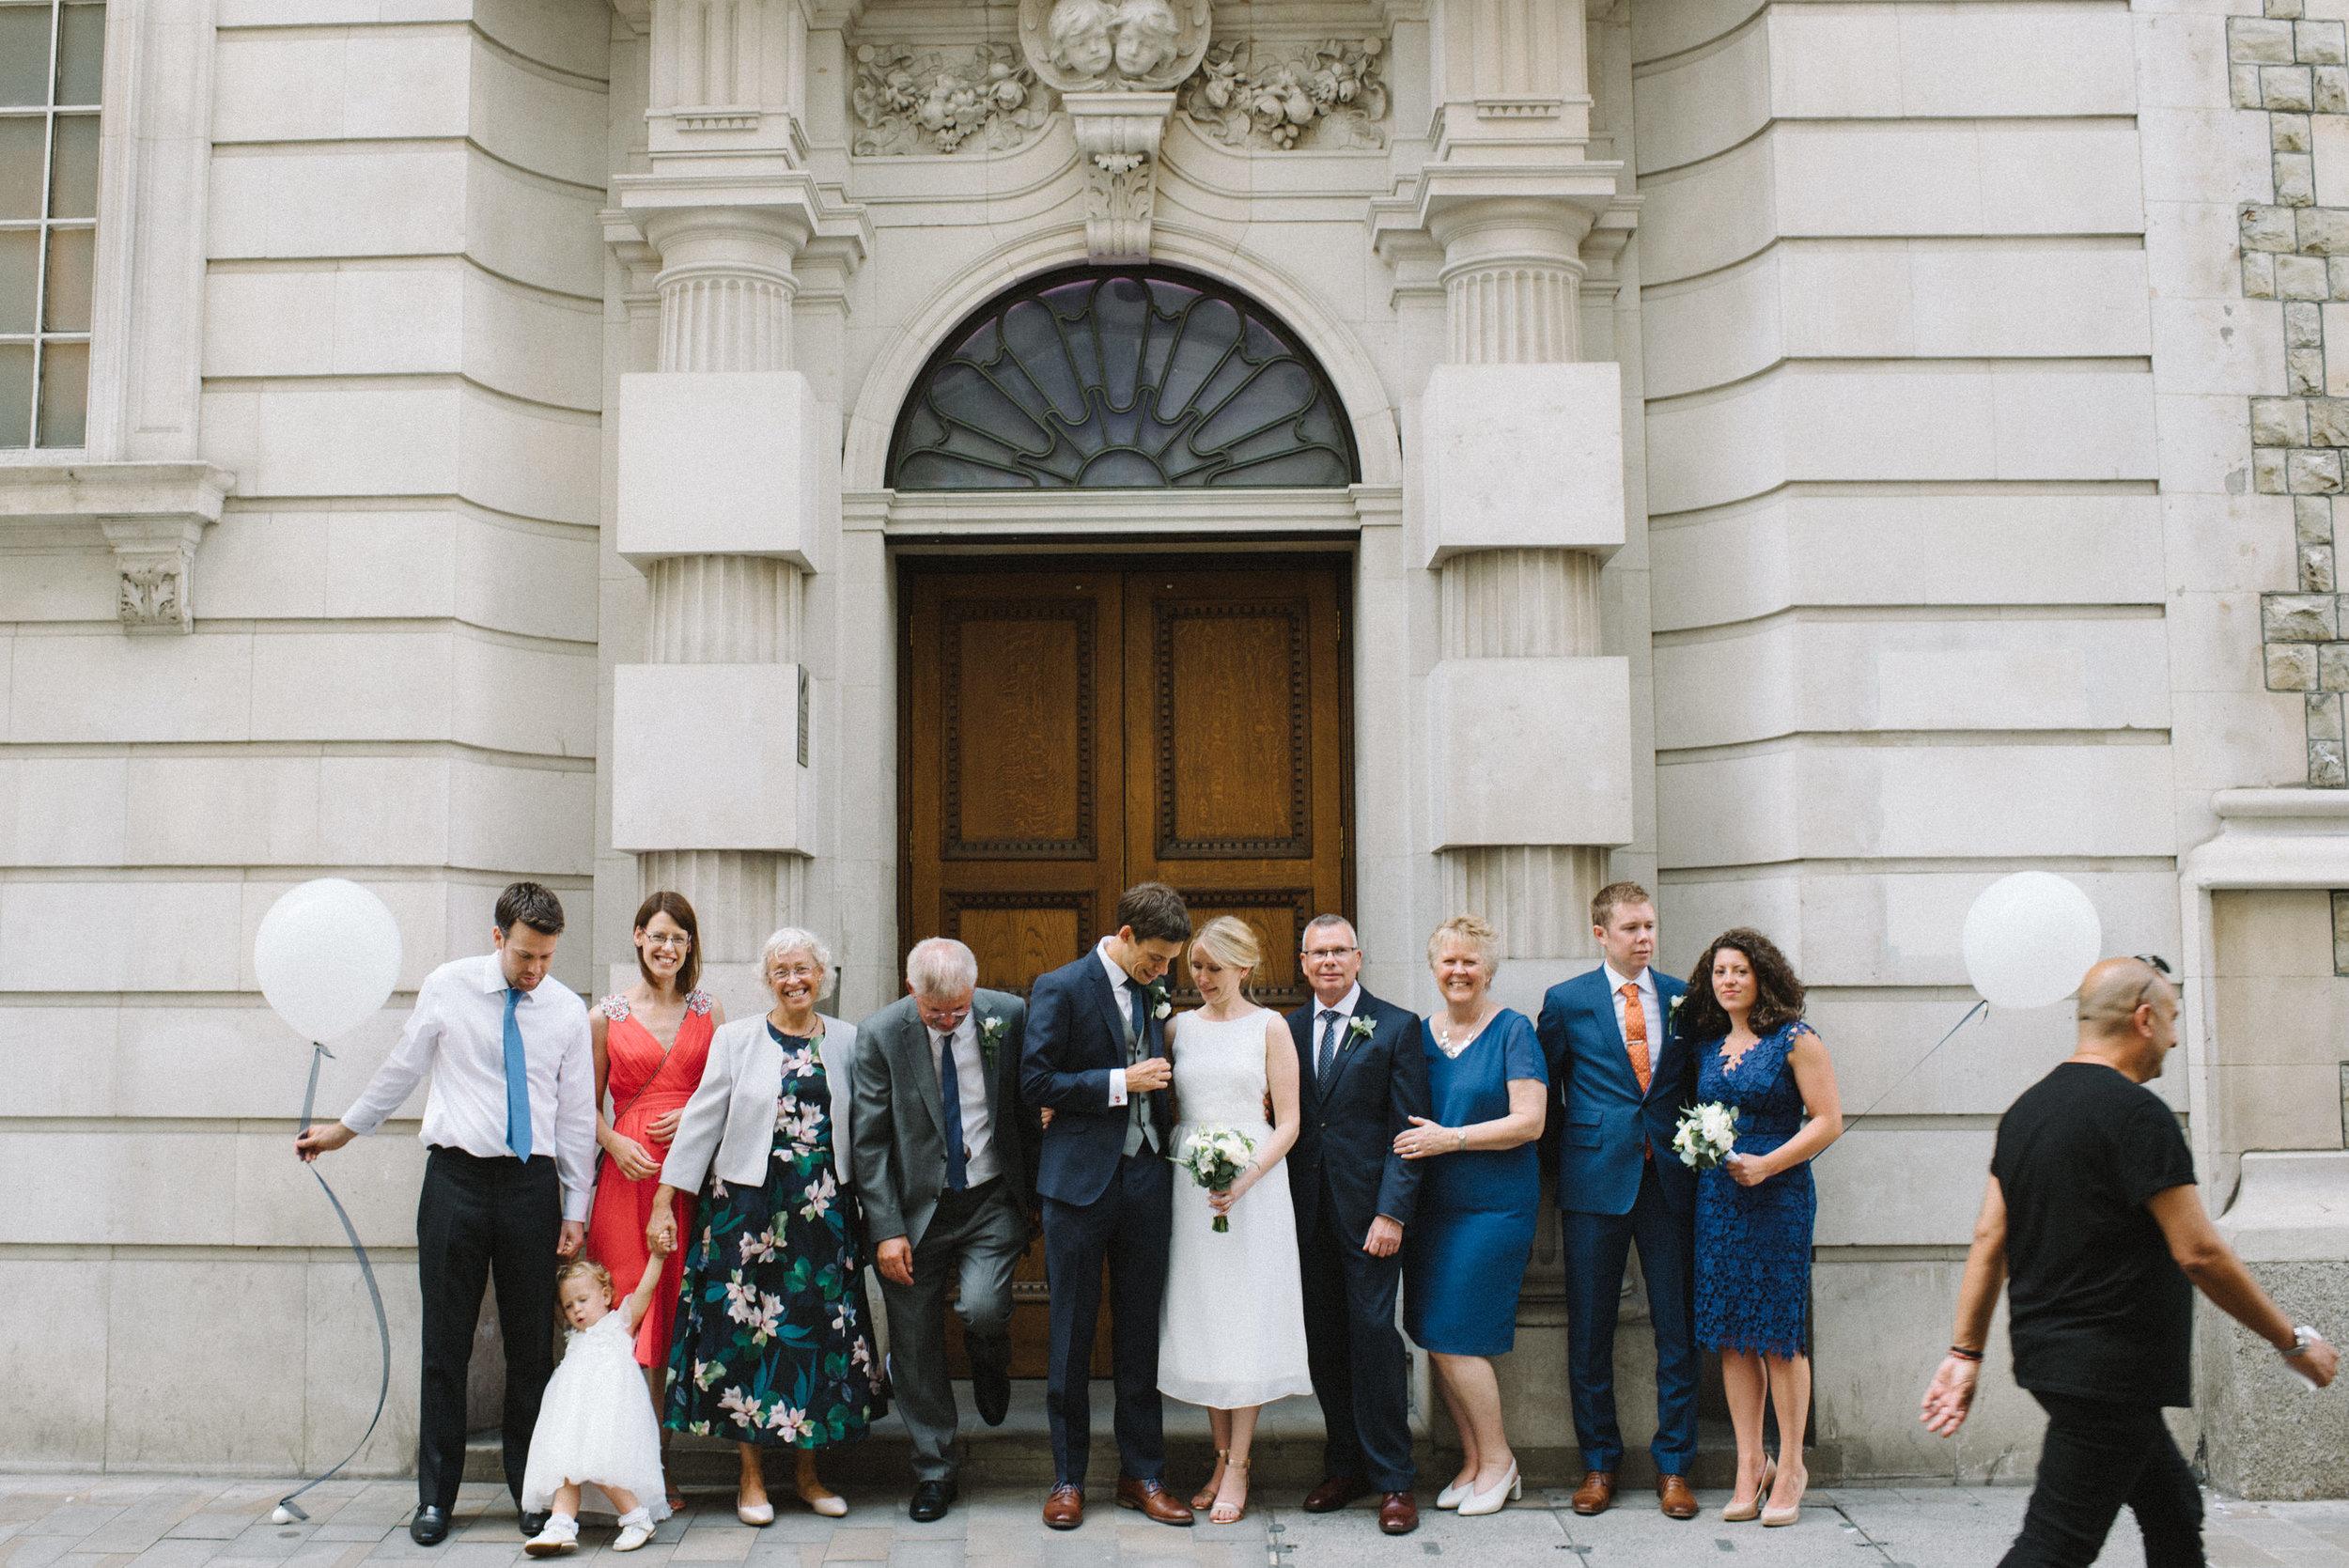 0141-LISA-DEVINE-PHOTOGRAPHY-ALTERNATIVE-WEDDING-PHOTOGRAPHY-SCOTLAND-DESTINATION-WEDDINGS-GLASGOW-WEDDINGS-COOL-WEDDINGS-STYLISH-WEDDINGS.JPG